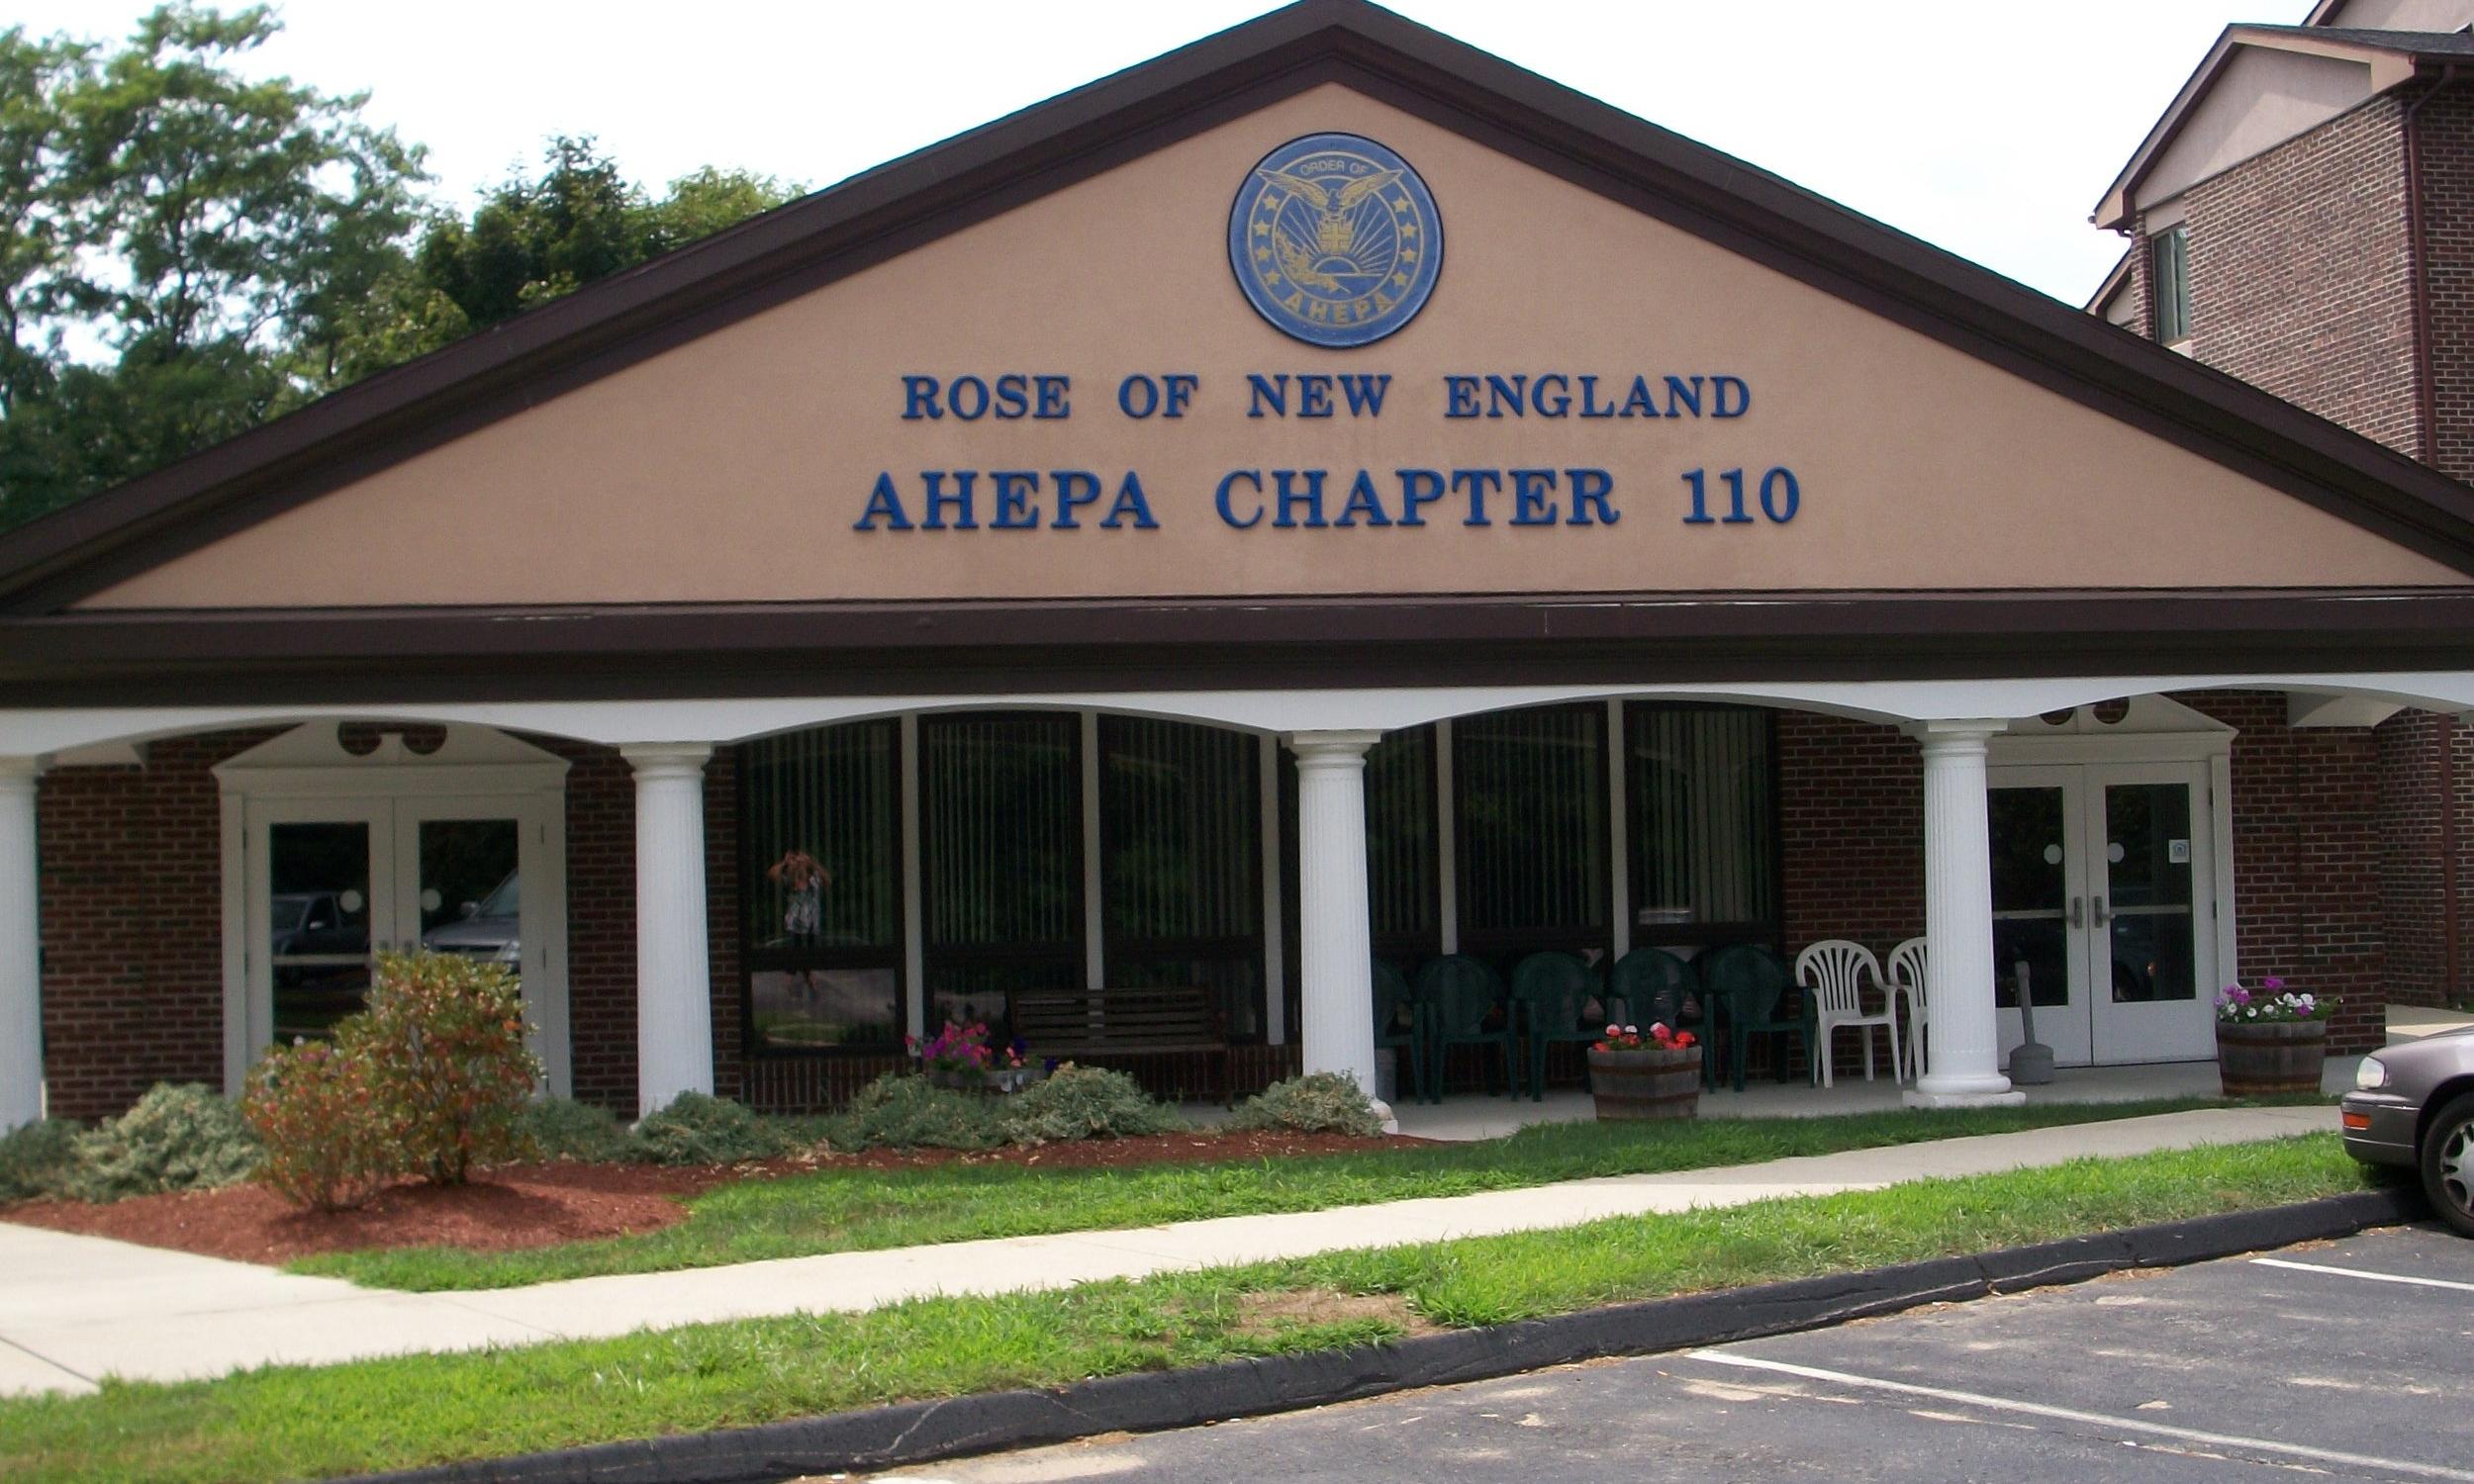 AHEPA 110 Senior Apartments - 110 Pukallus AvenueNorwich, CT 06360(860) 823-1131TTY: (800) 676-3777 or 711 (English)TTY: (800) 676-4290 or 711 (Español)info@ahepahousing.org